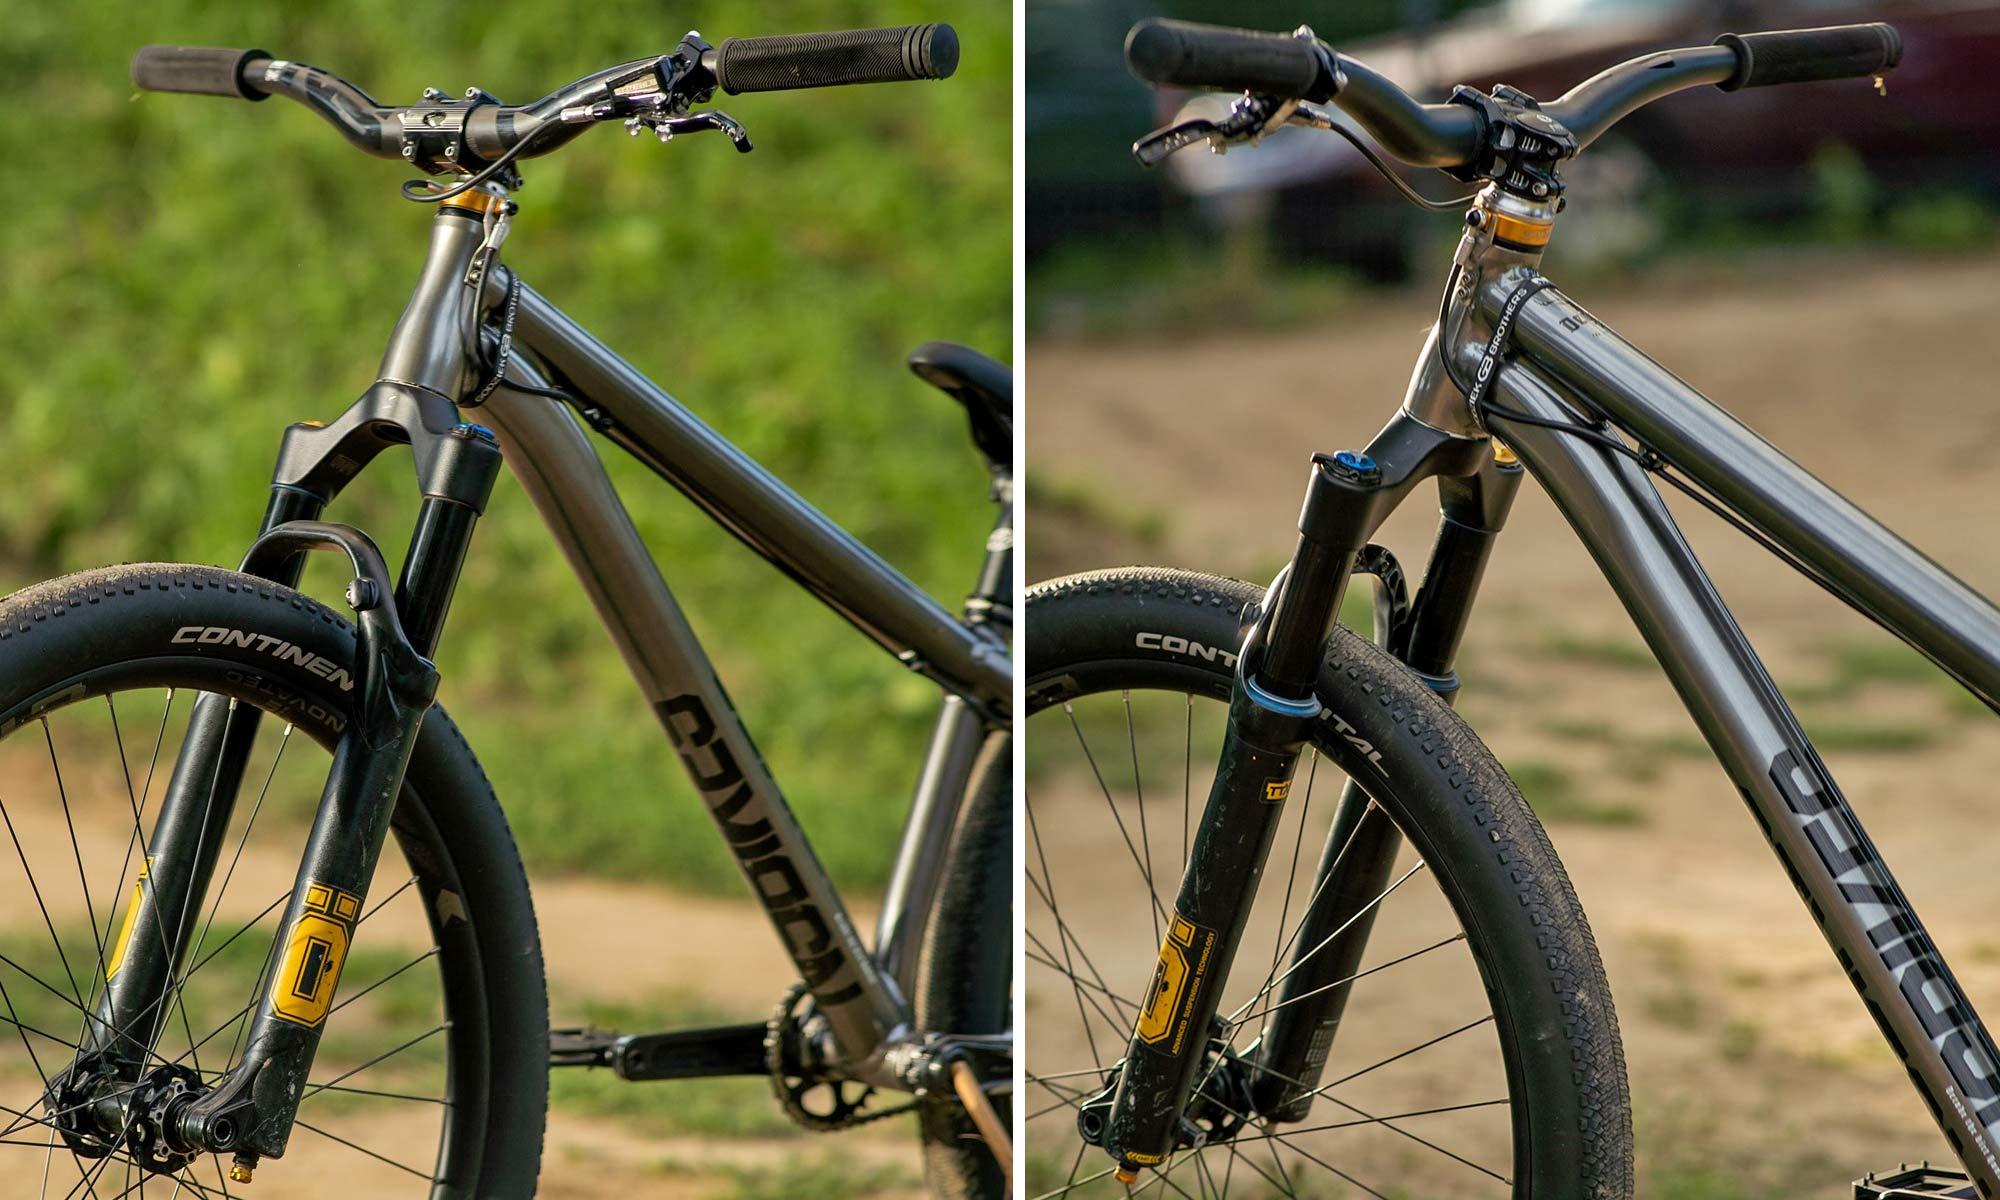 Szymon Godziek NS Bikes Decade, Ohlins fork